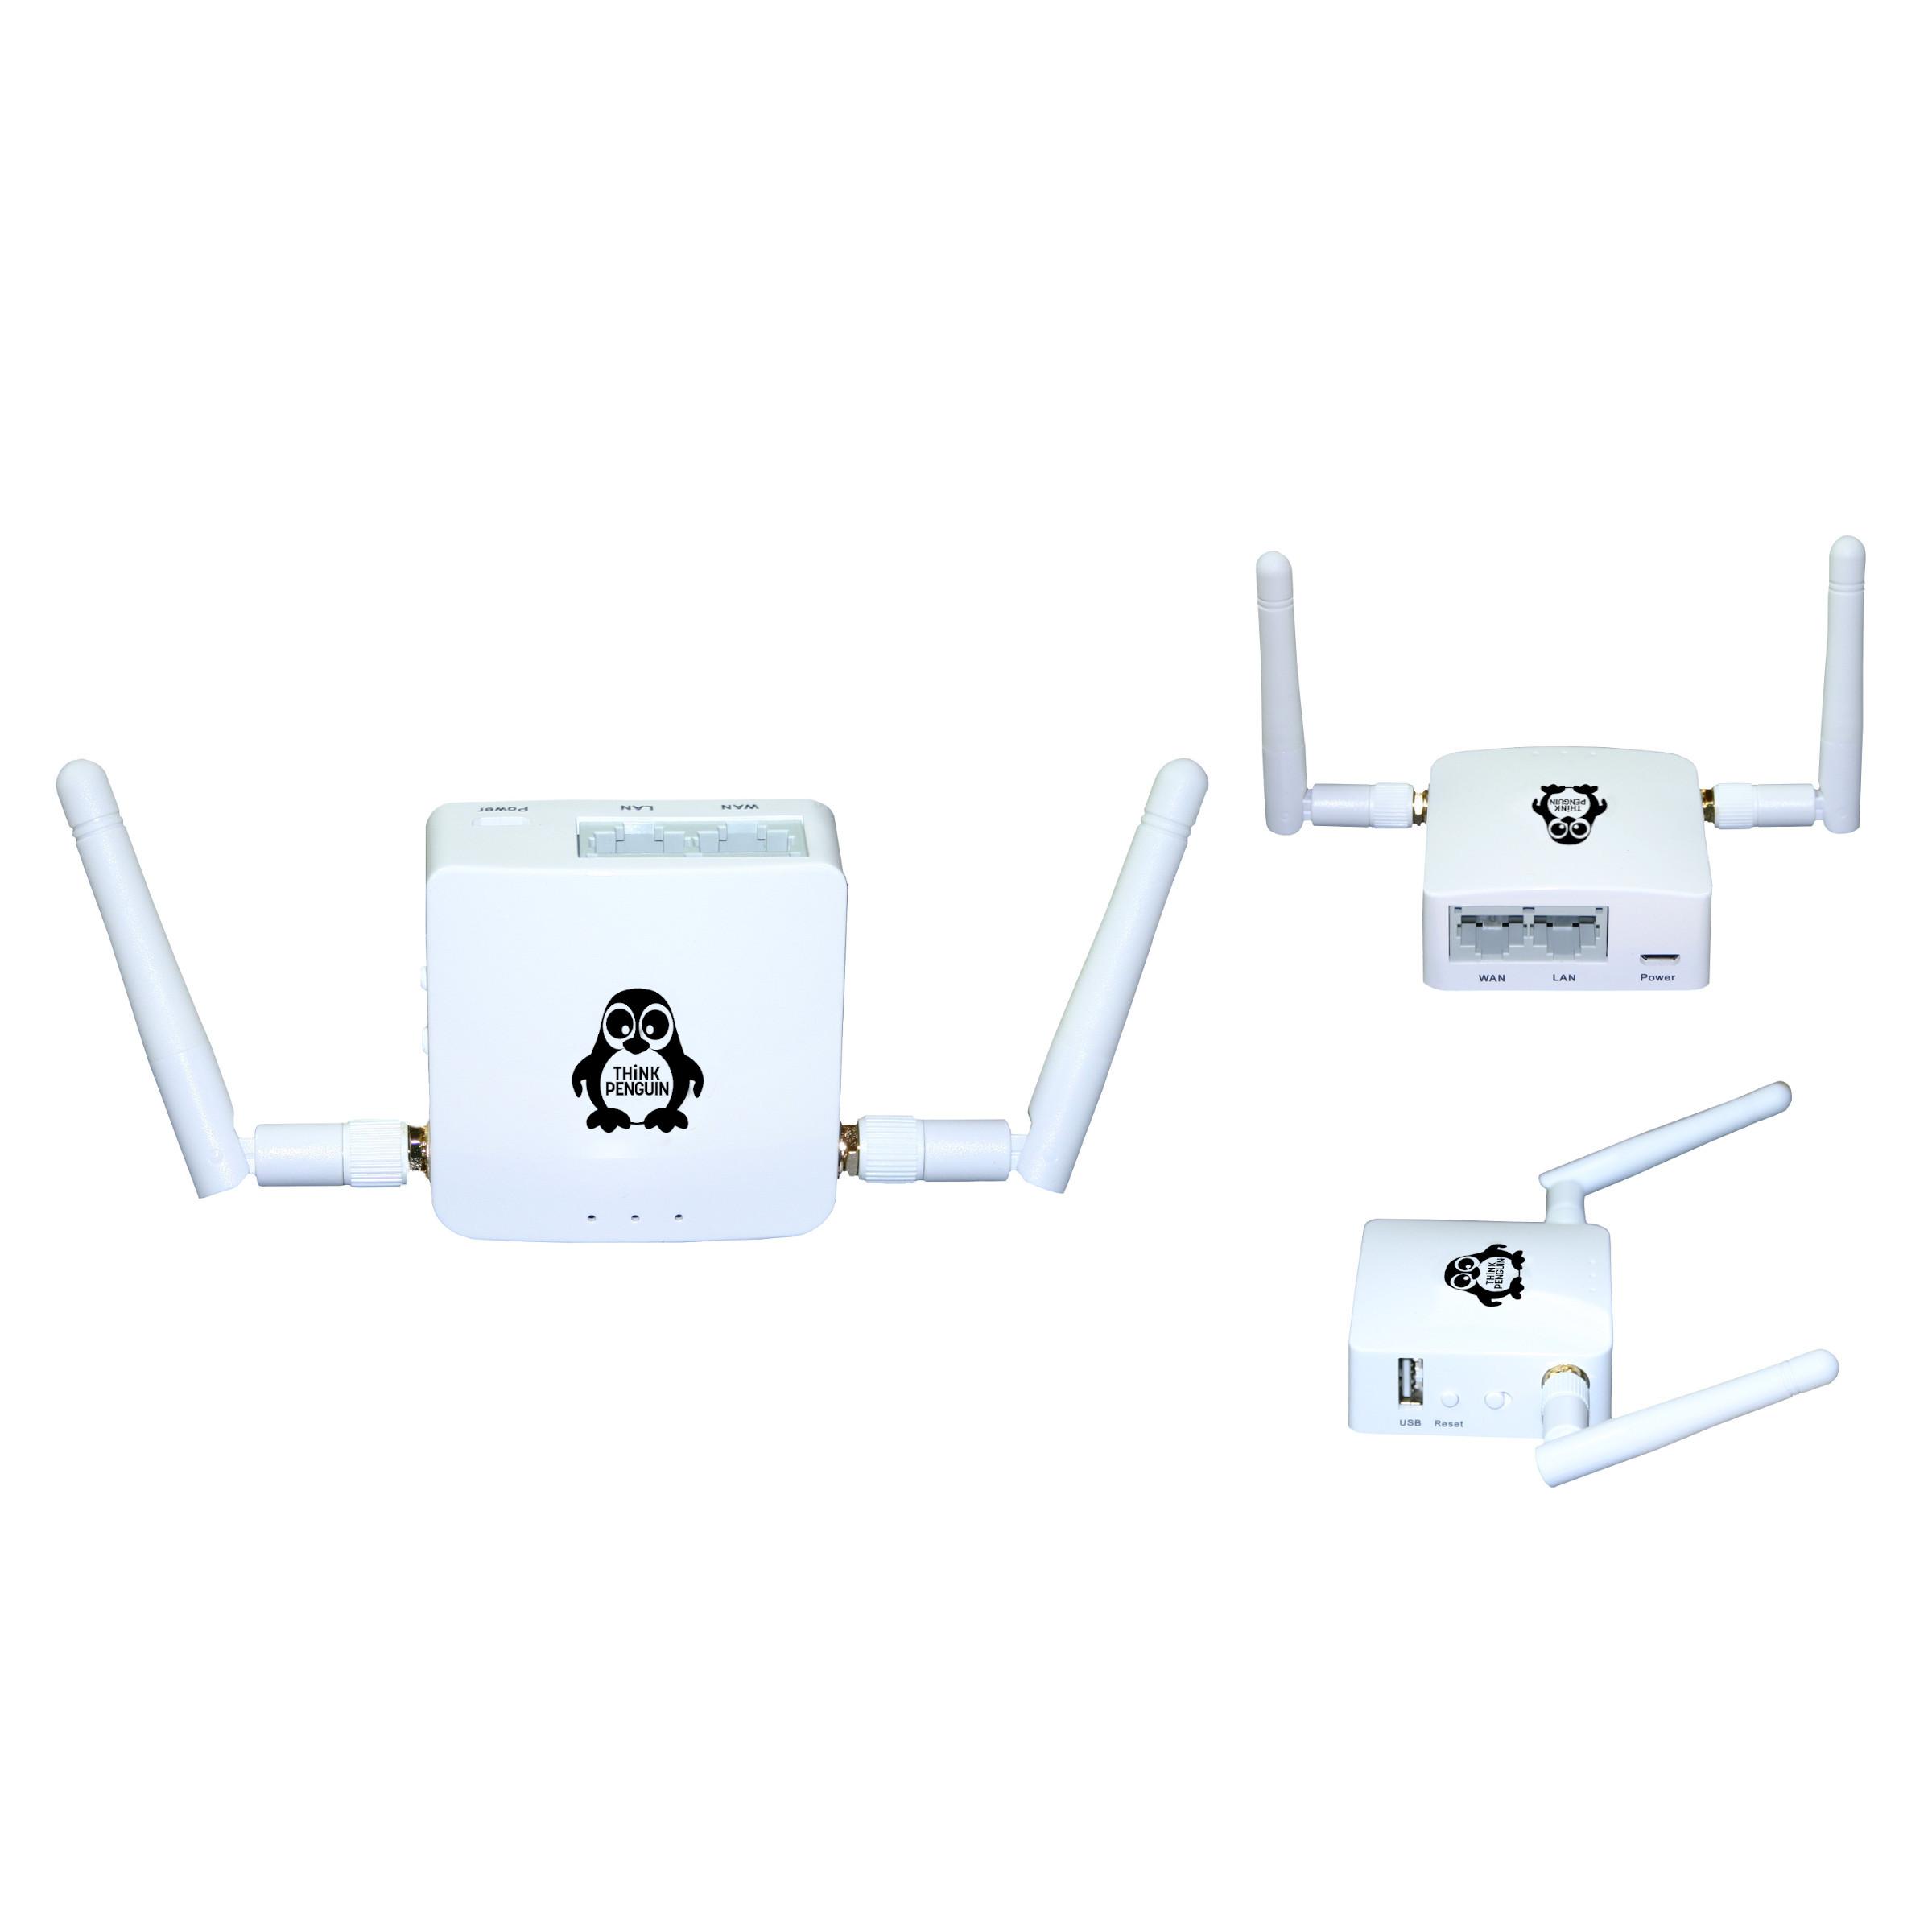 ThinkPenguin mini-routers